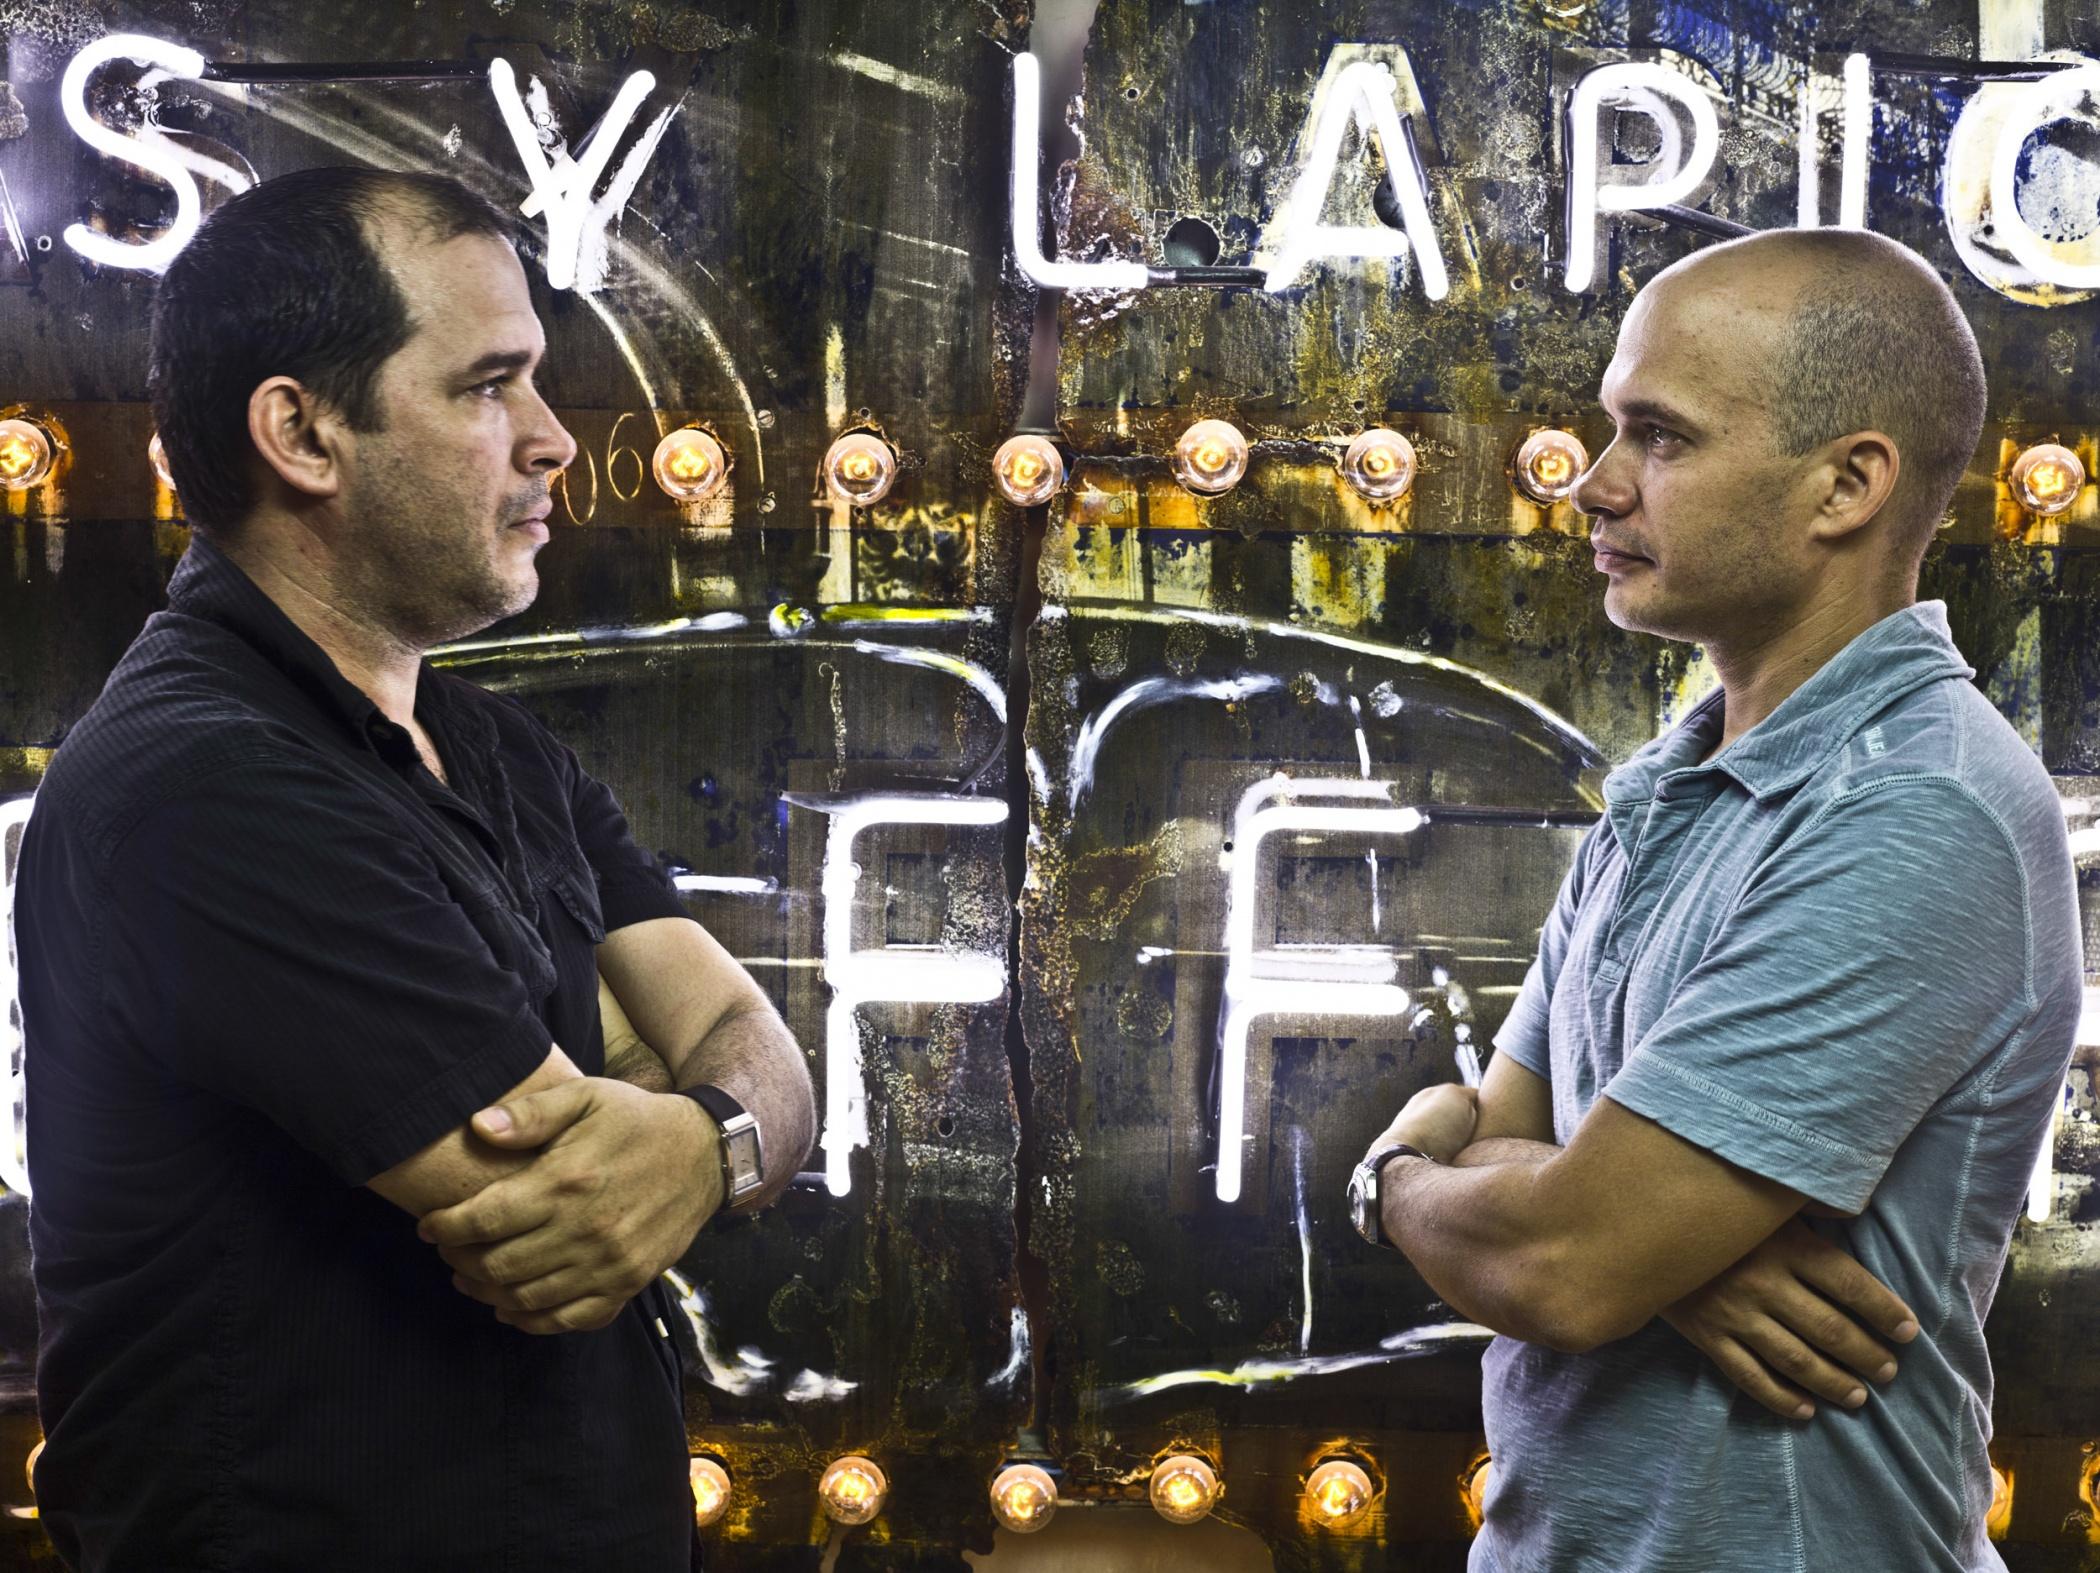 Kadir López y Kelvin López, painters - Illuminated Cuba - Hector Garrido, Aerial and human photography